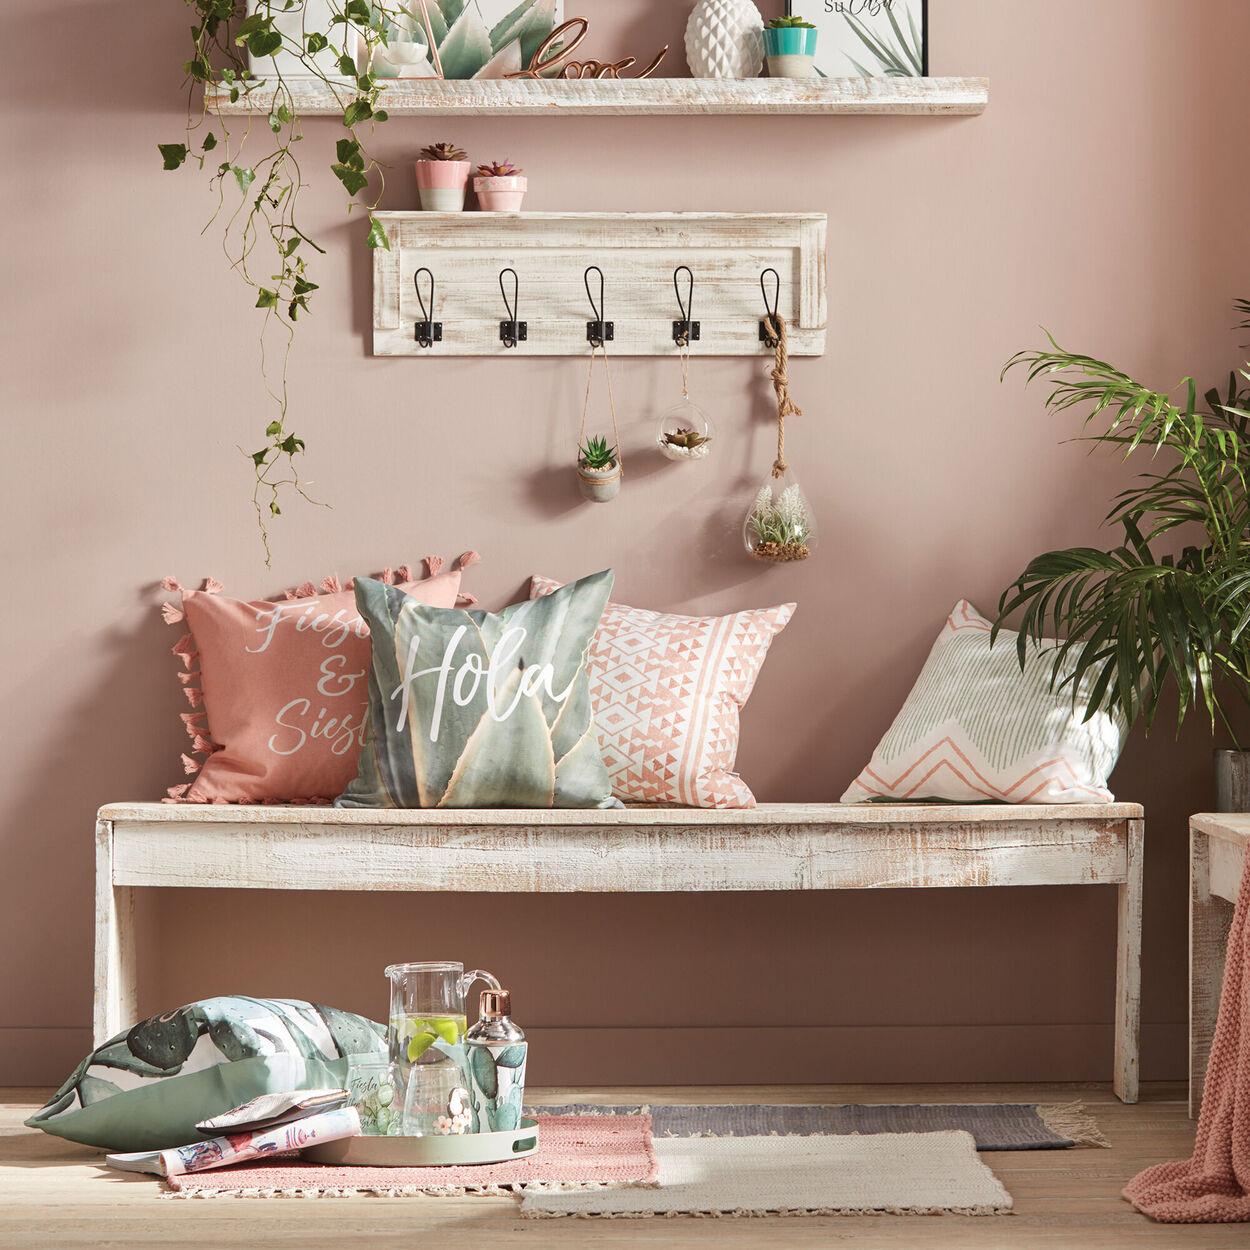 "Hola Decorative Decorative Pillow Cover 18"" X 18"""